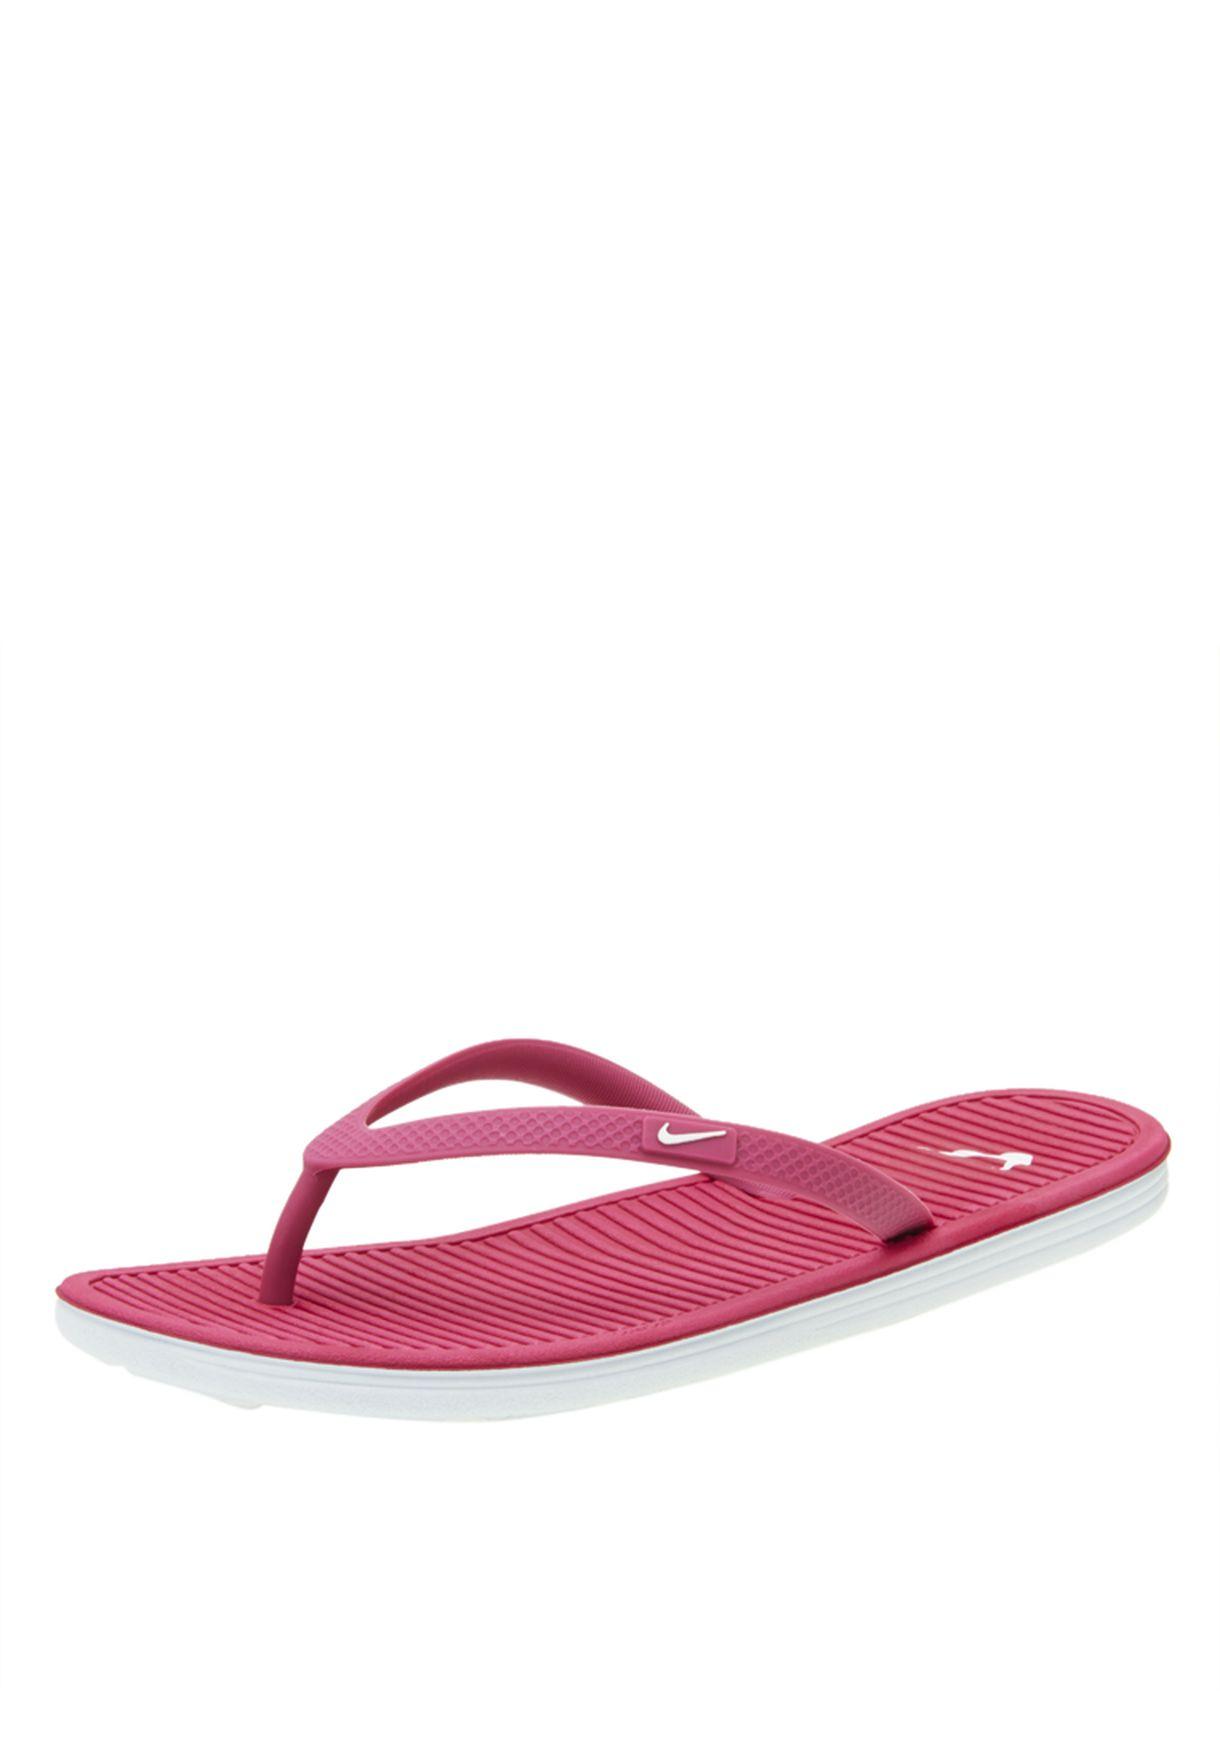 363dc9138ff6 Shop Nike pink Solarsoft Thong II 488161-601 for Women in UAE ...